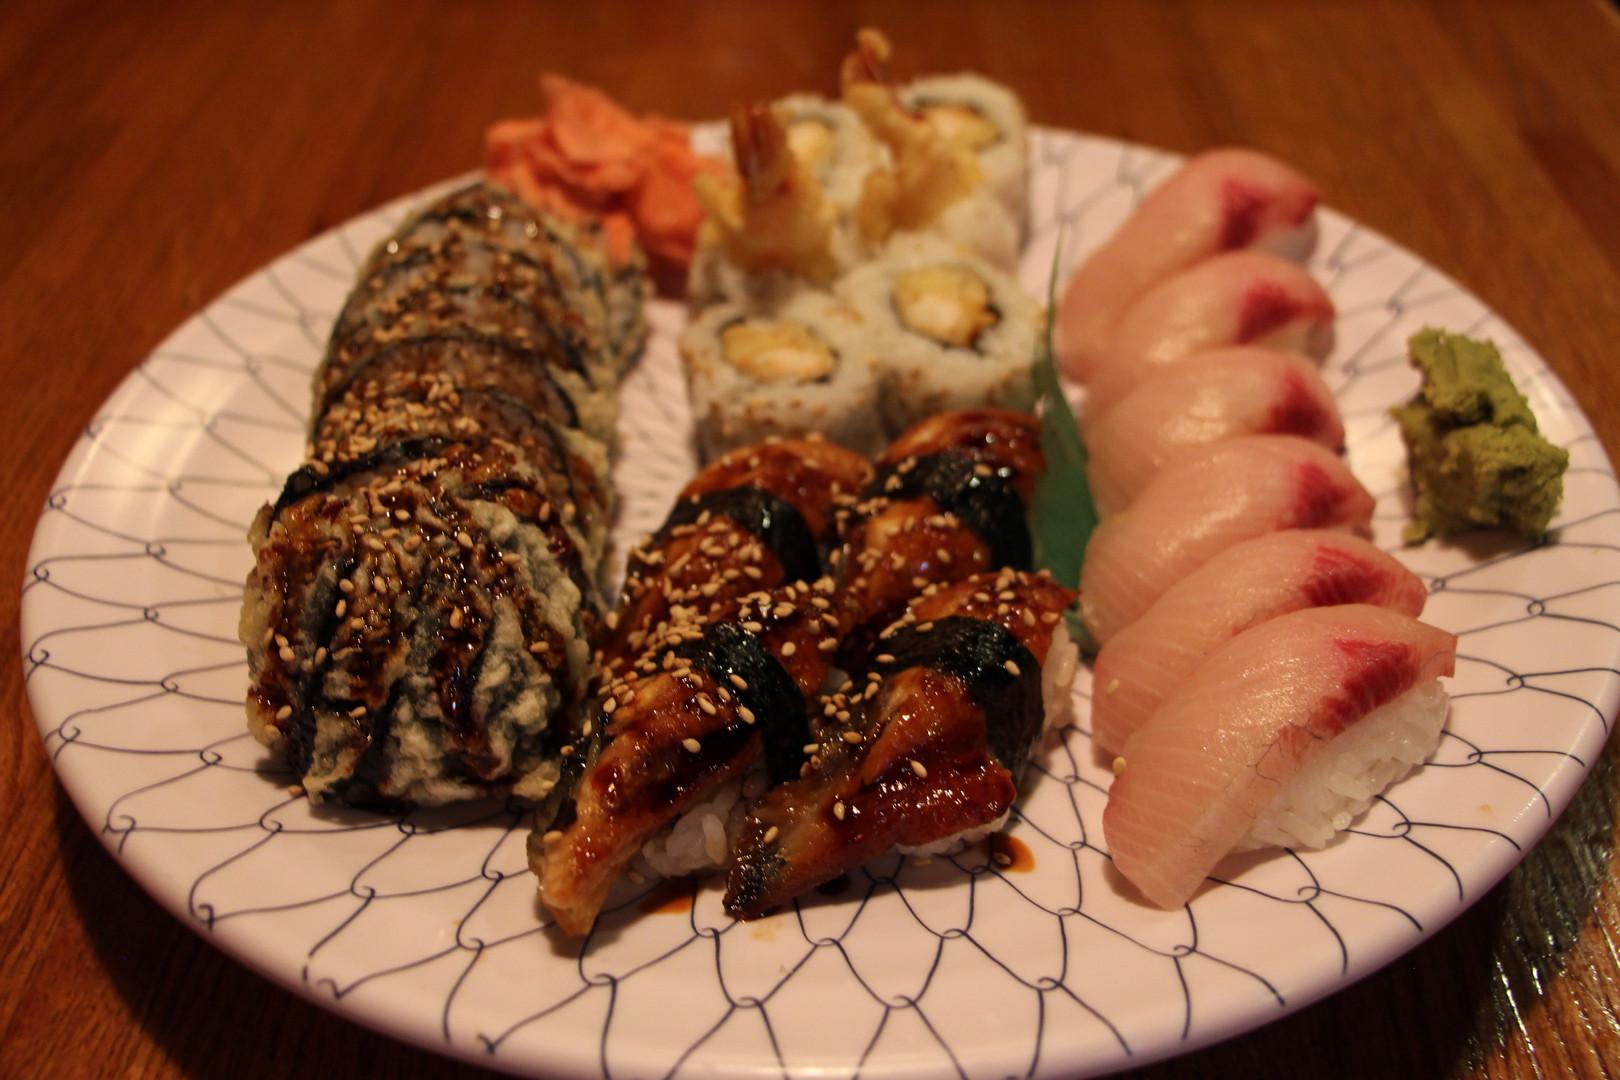 Sushi & Roll Platter